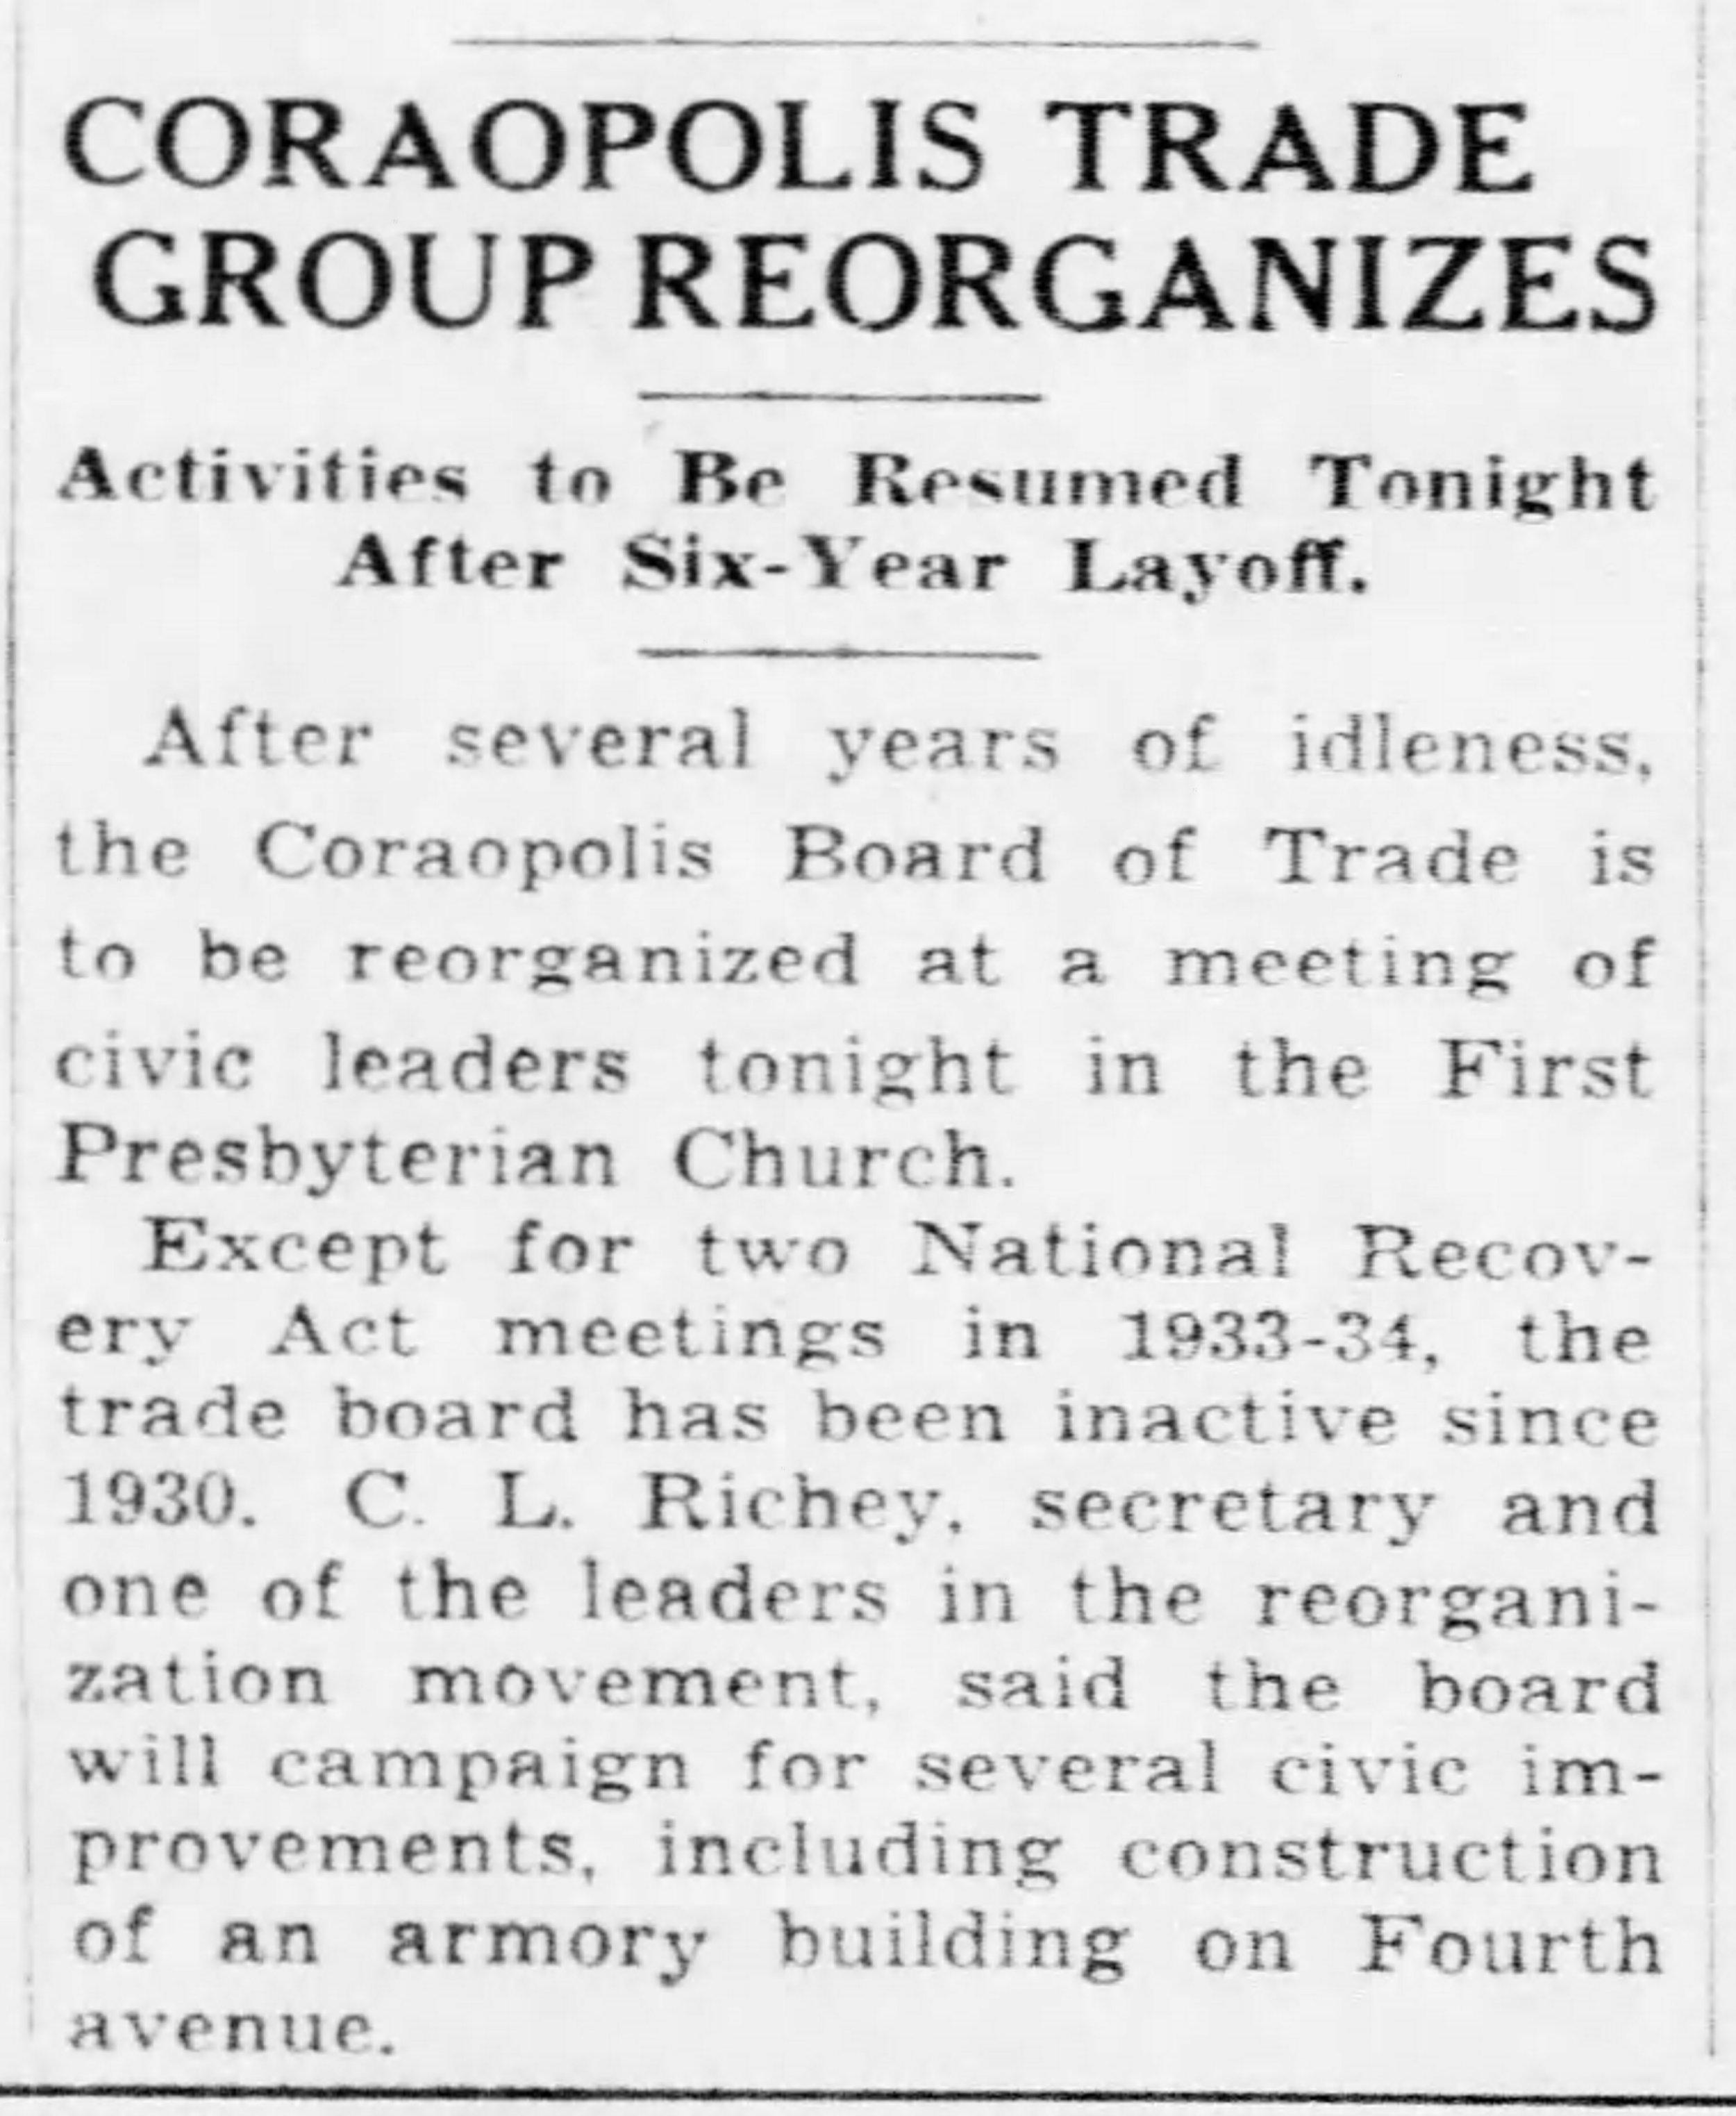 1936-12-07 Pittsburgh Post Gazette (v10, n110, P4)